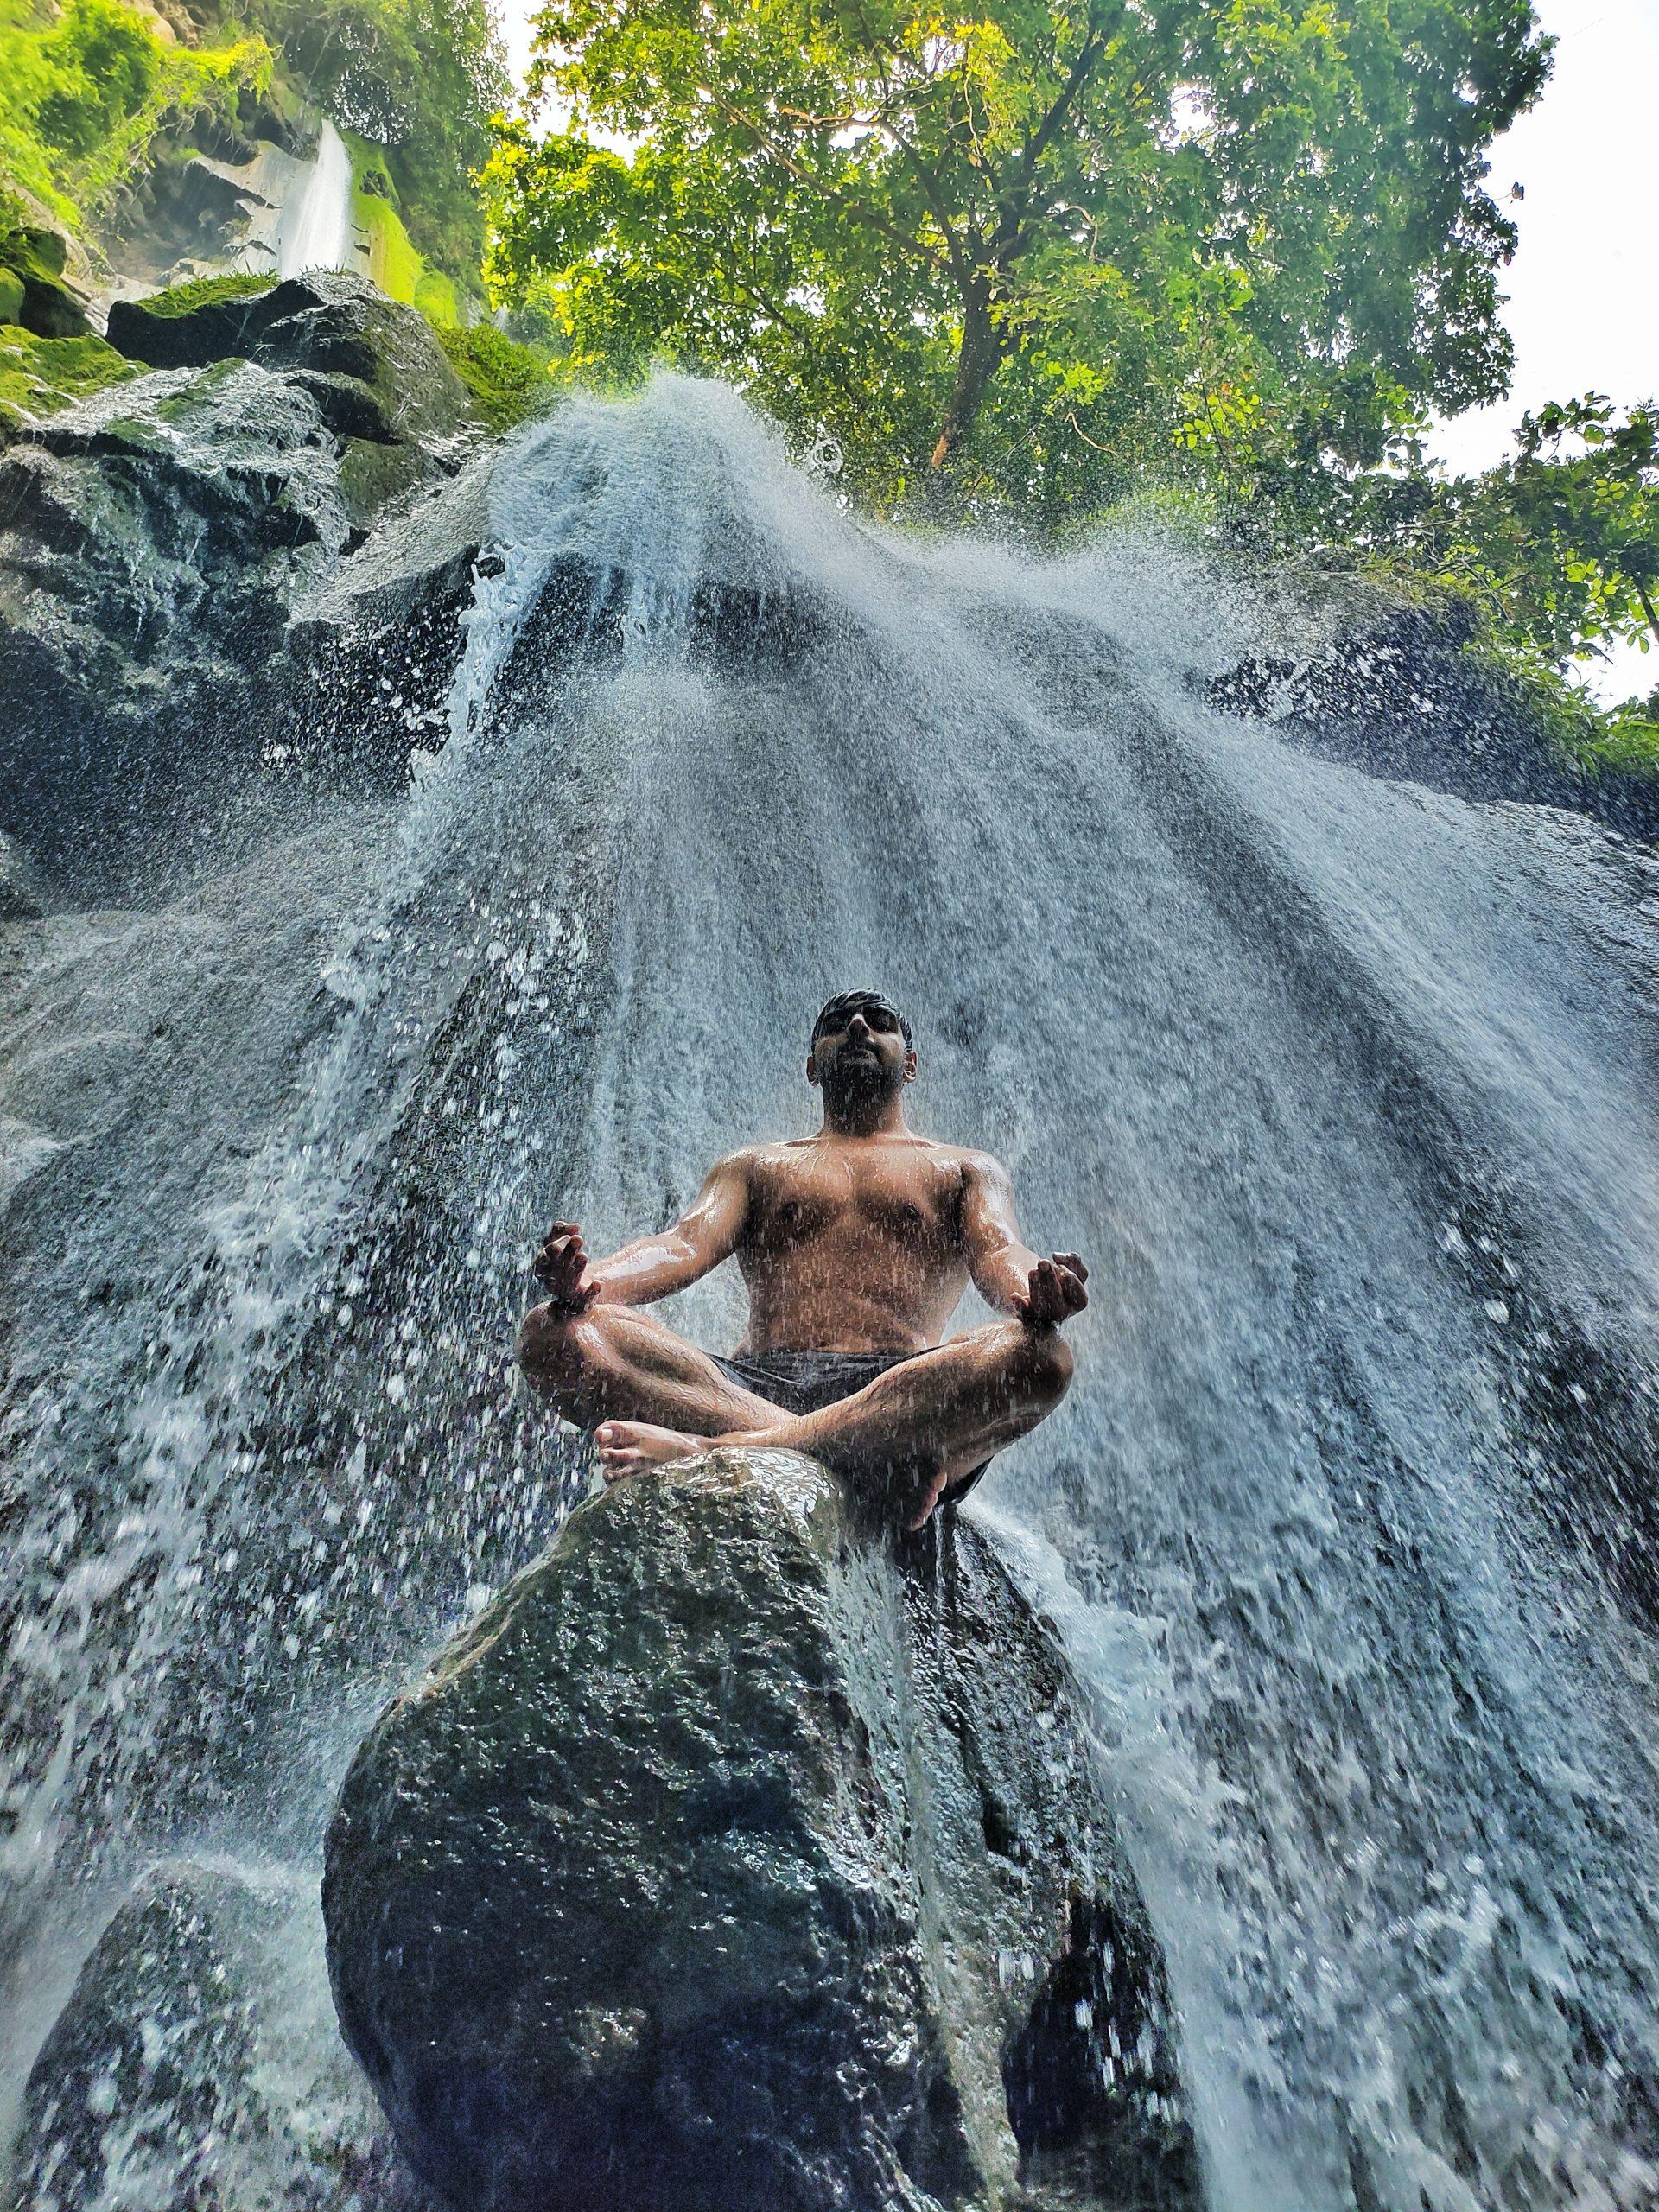 Yoga Exercise on the Waterfalls